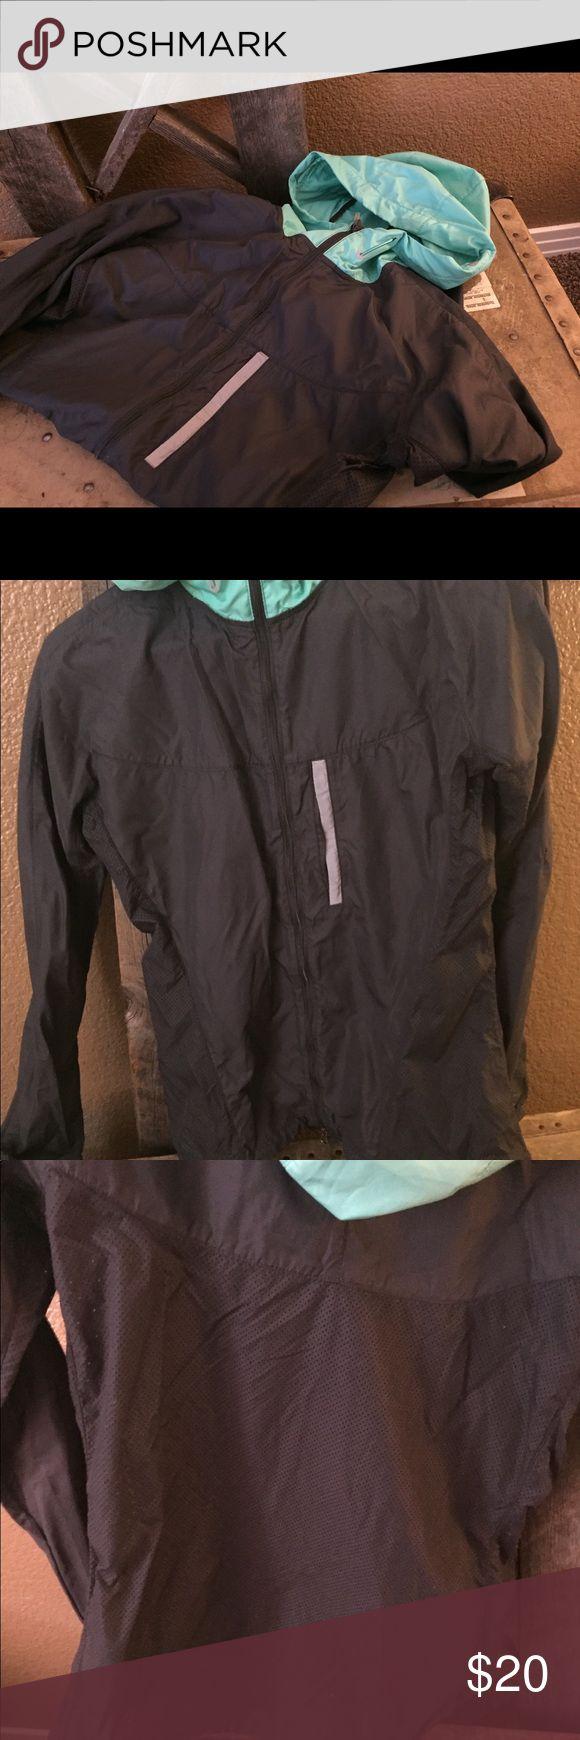 Nike zip up windbreaker rain jacket Nike Rain jacket/ wind breaker with mesh back Nike Jackets & Coats